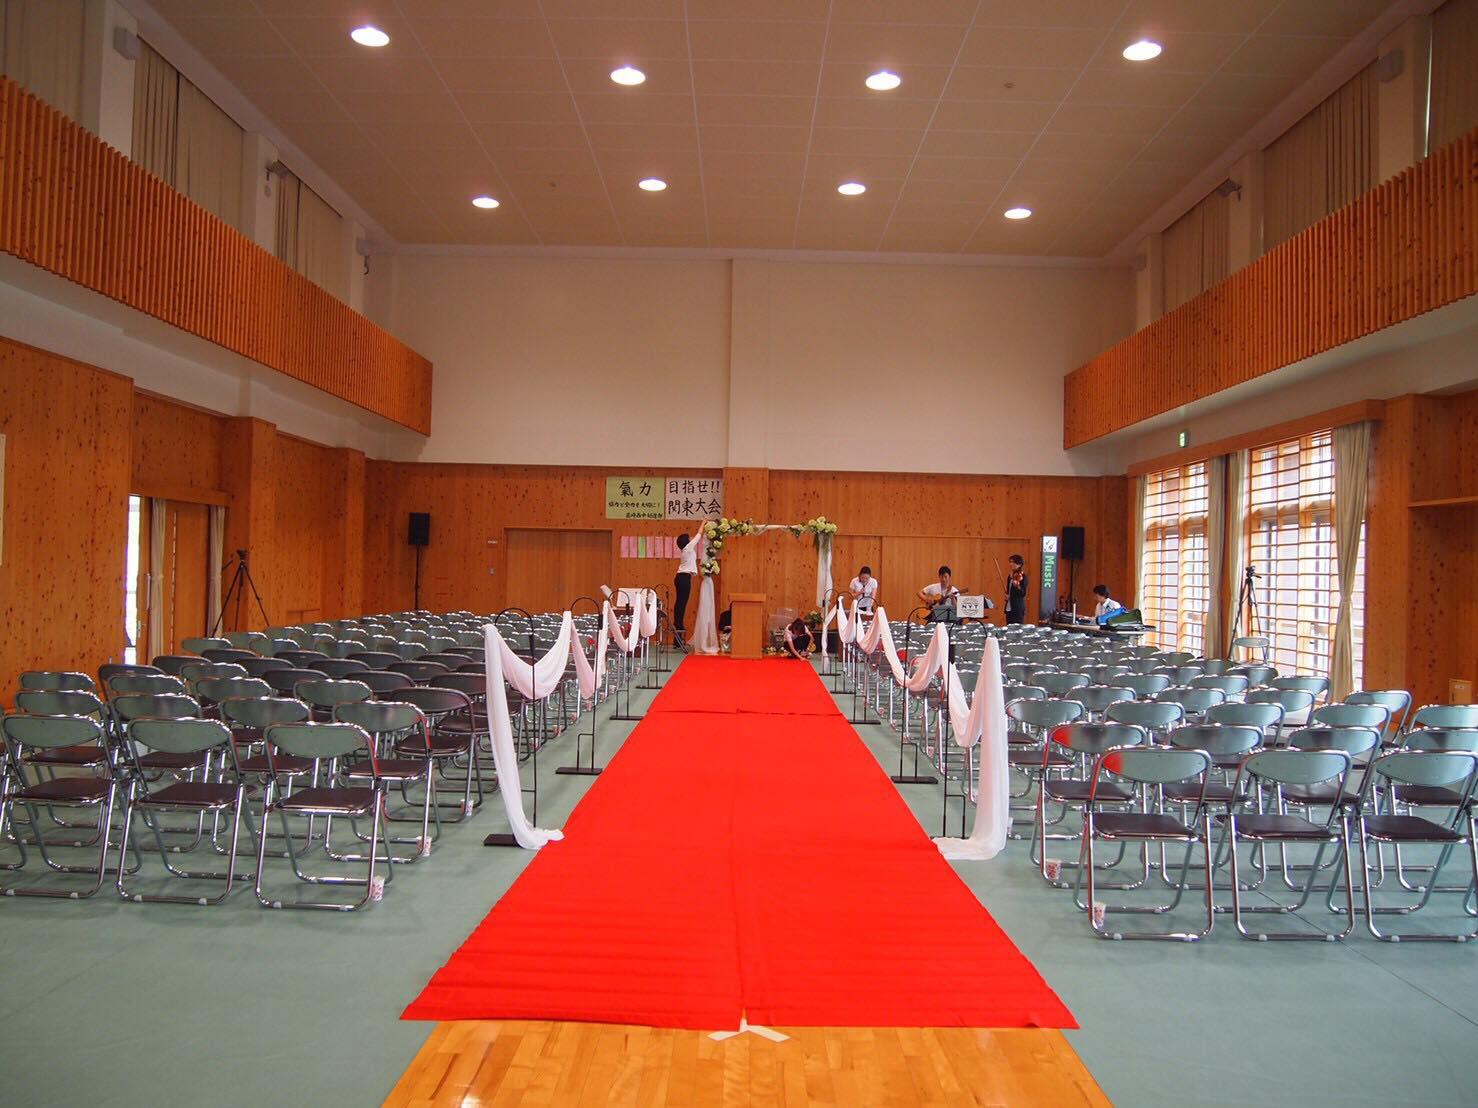 韮崎西中学校 学校ウエディング 当日-19